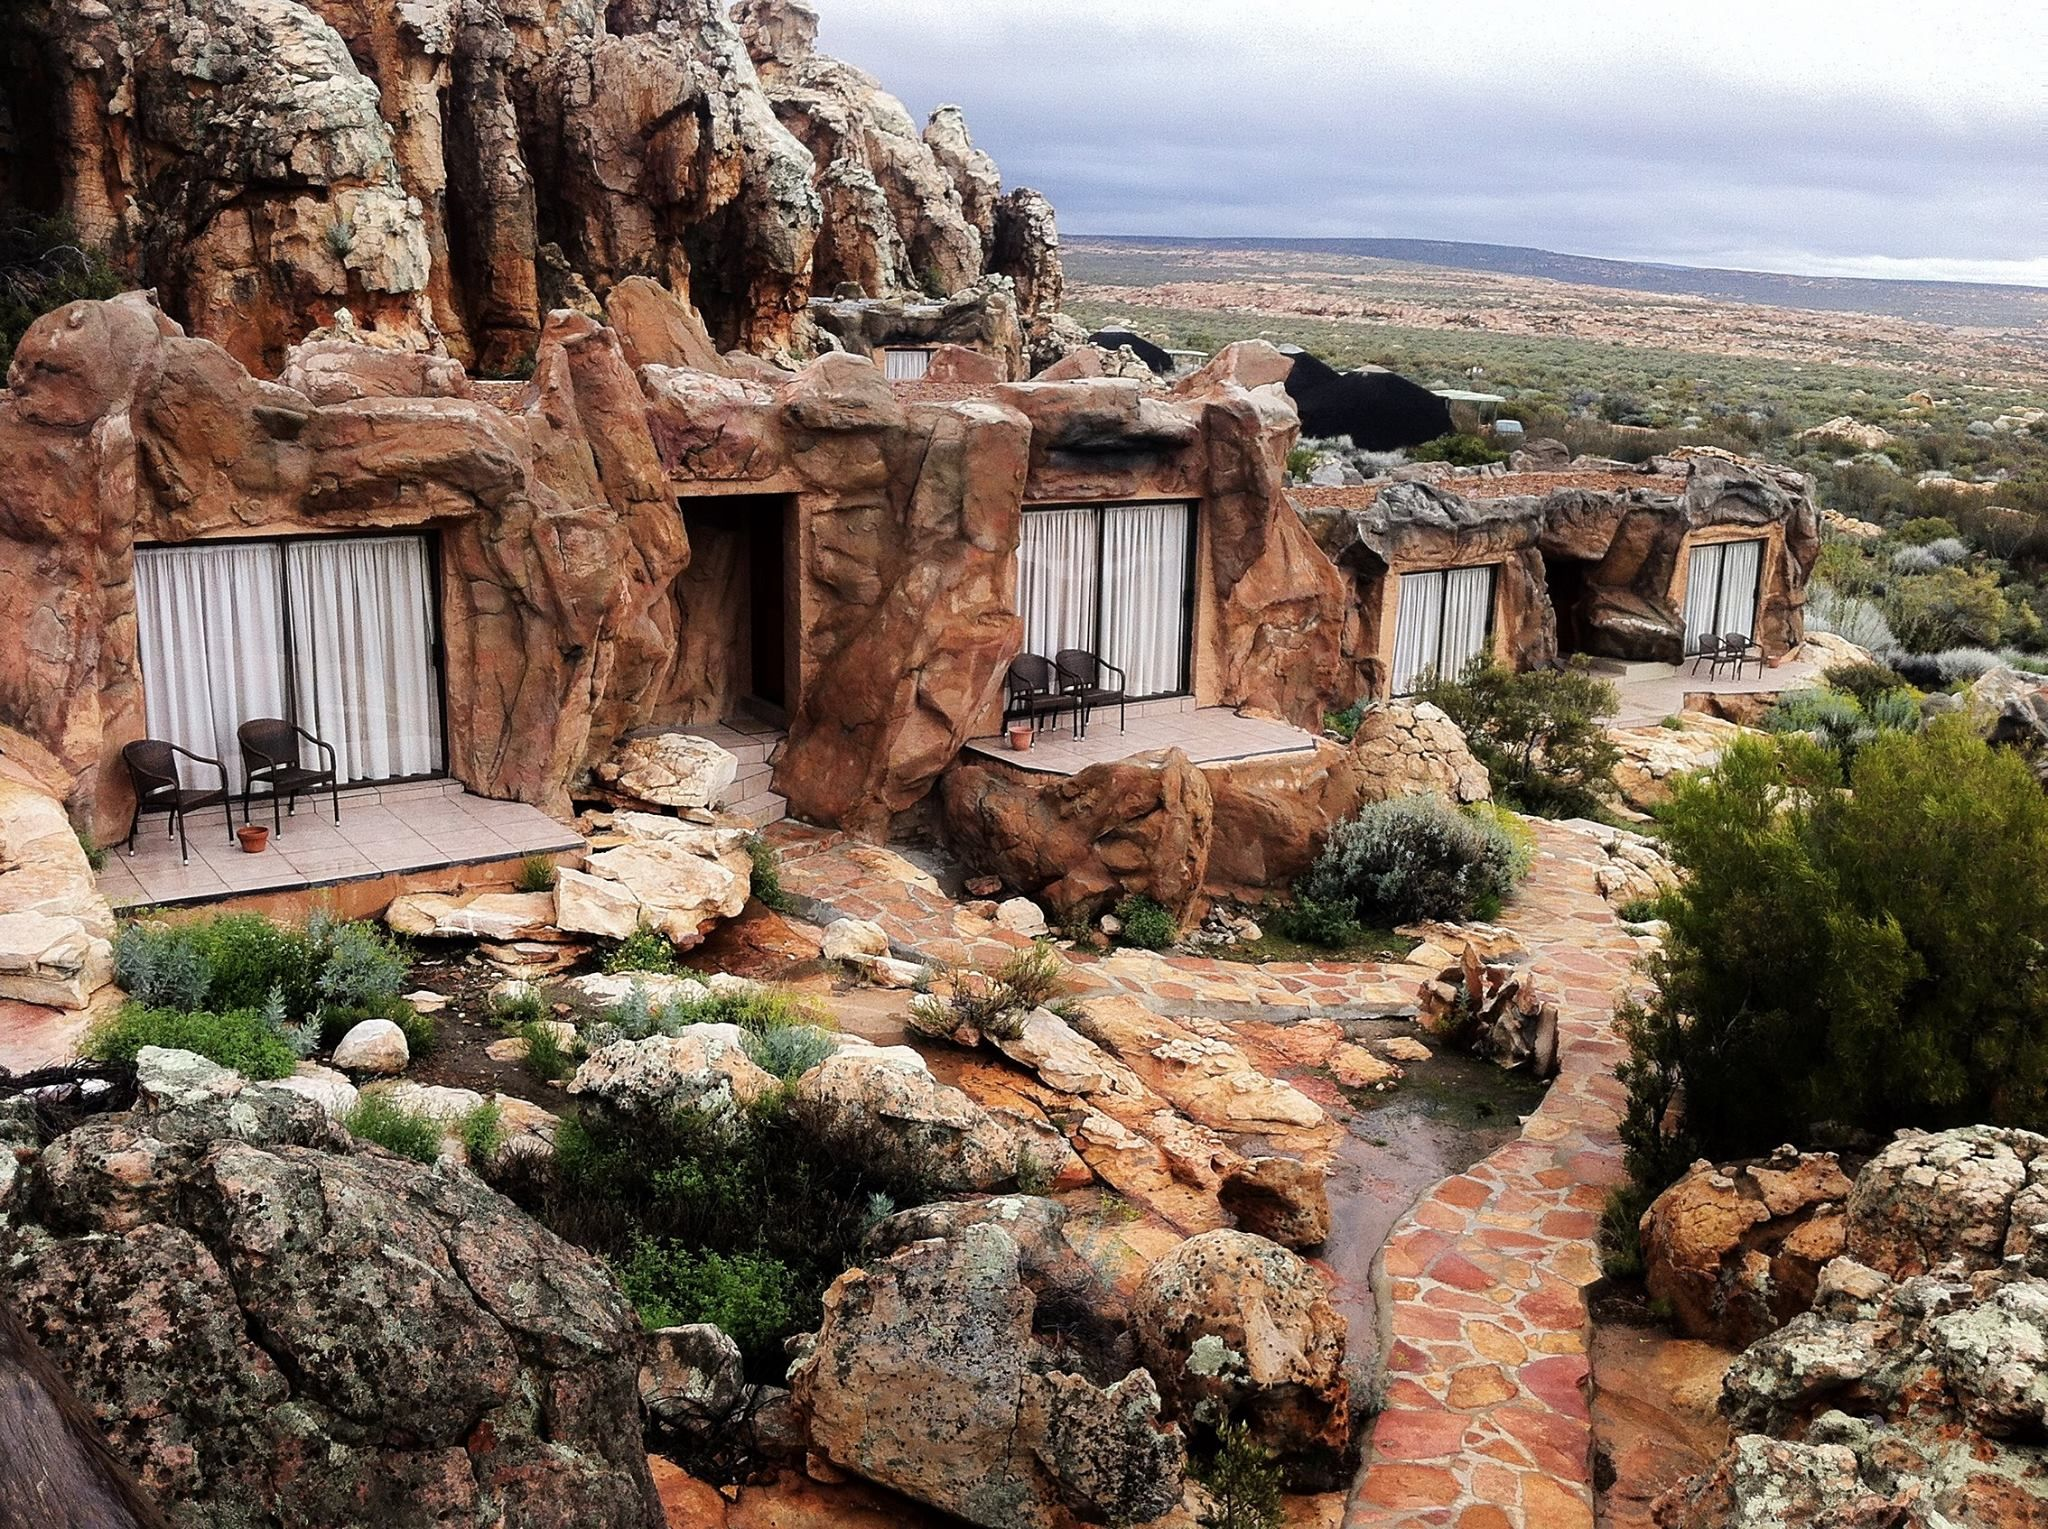 Kagga Kamma Nature Reserve South Africa Africa Adventure Nature Reserve Luxury Holidays Destinations